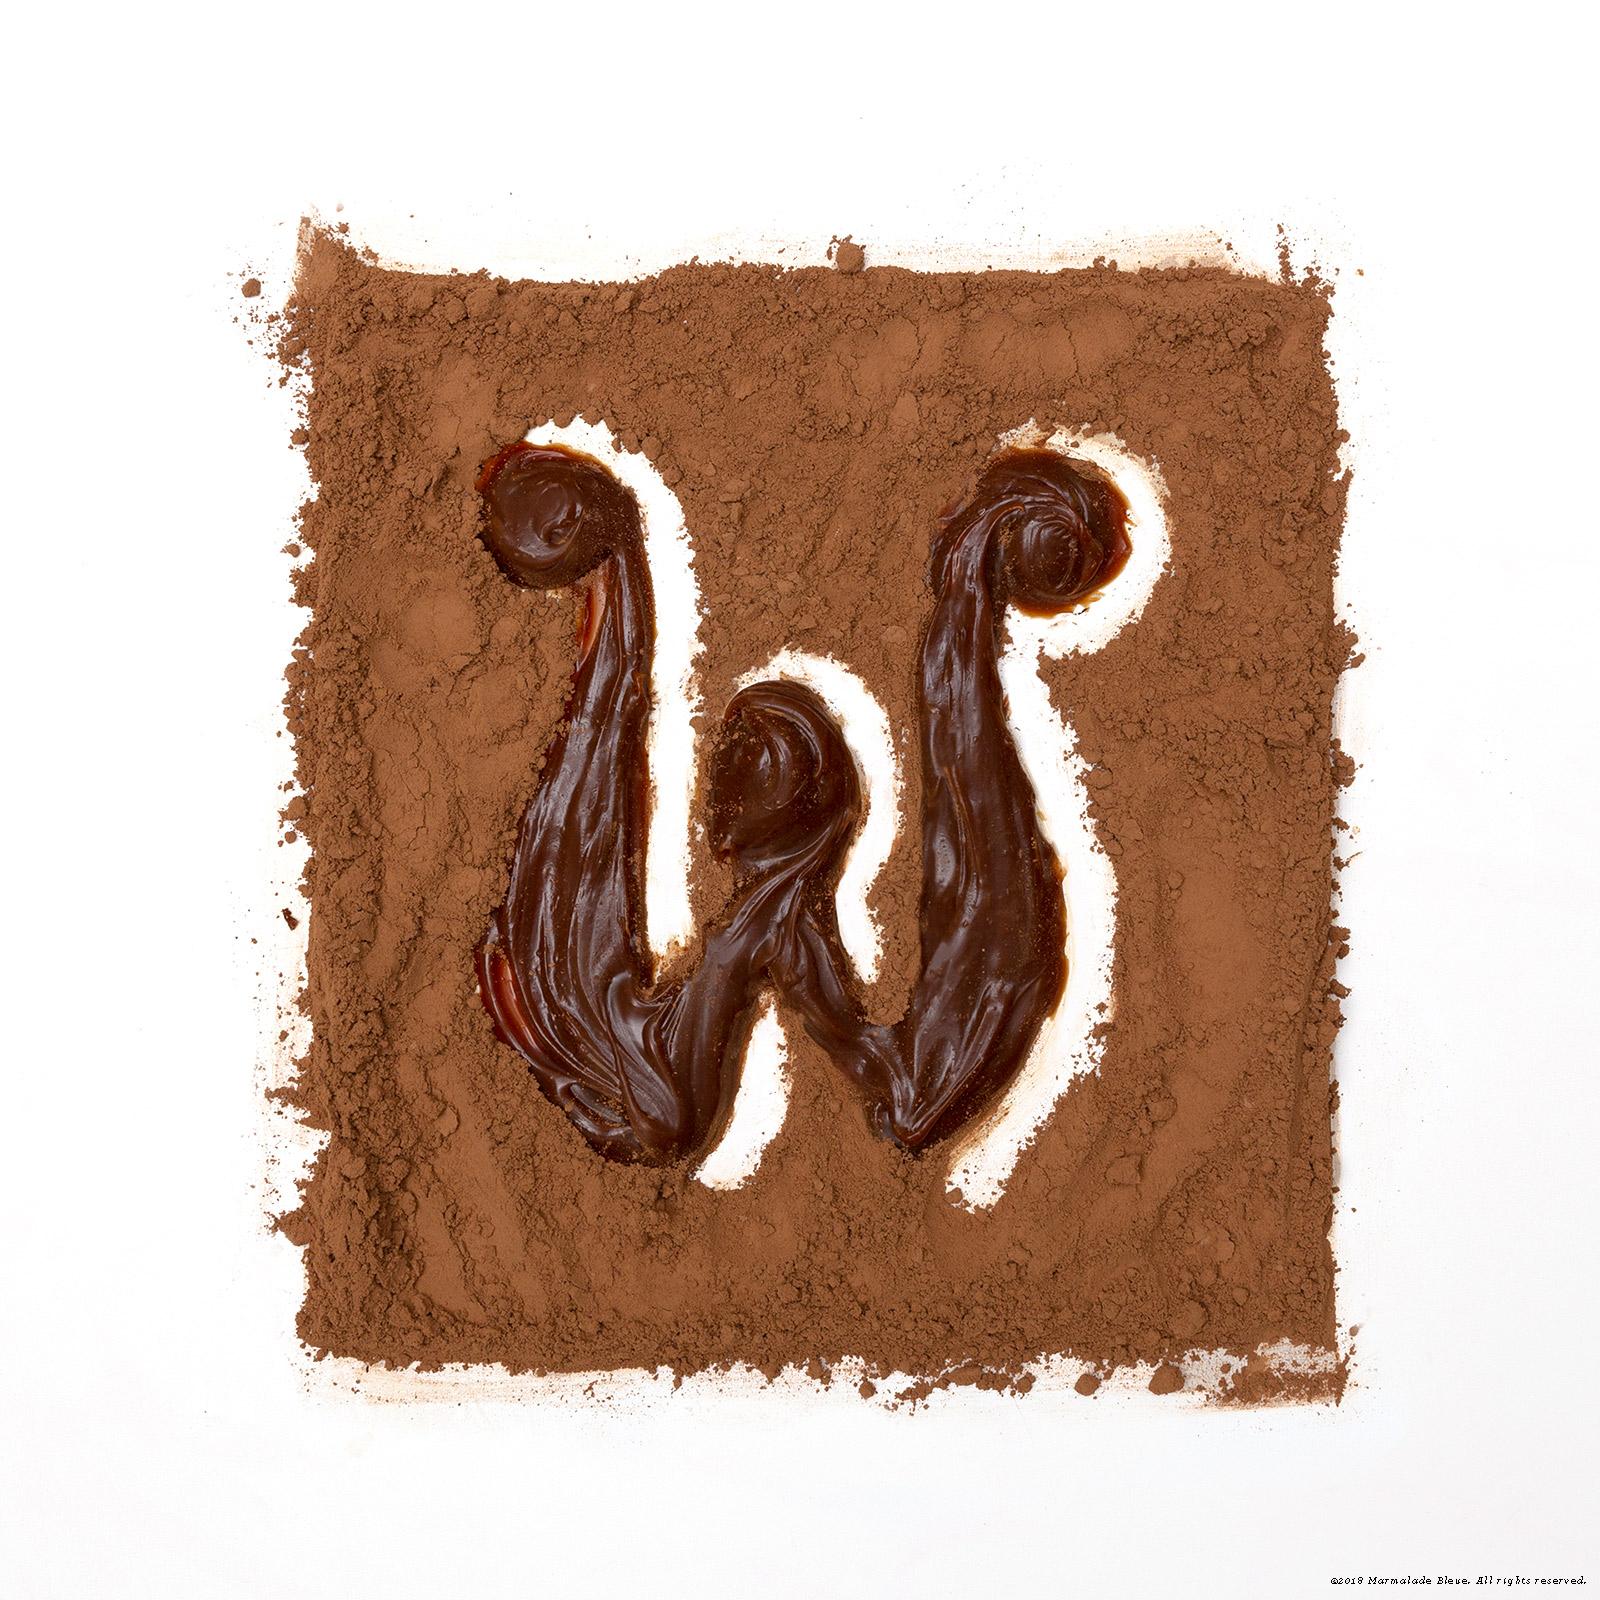 Oberlin-Chocolate's-Aftertaste-DropCap-final.jpg